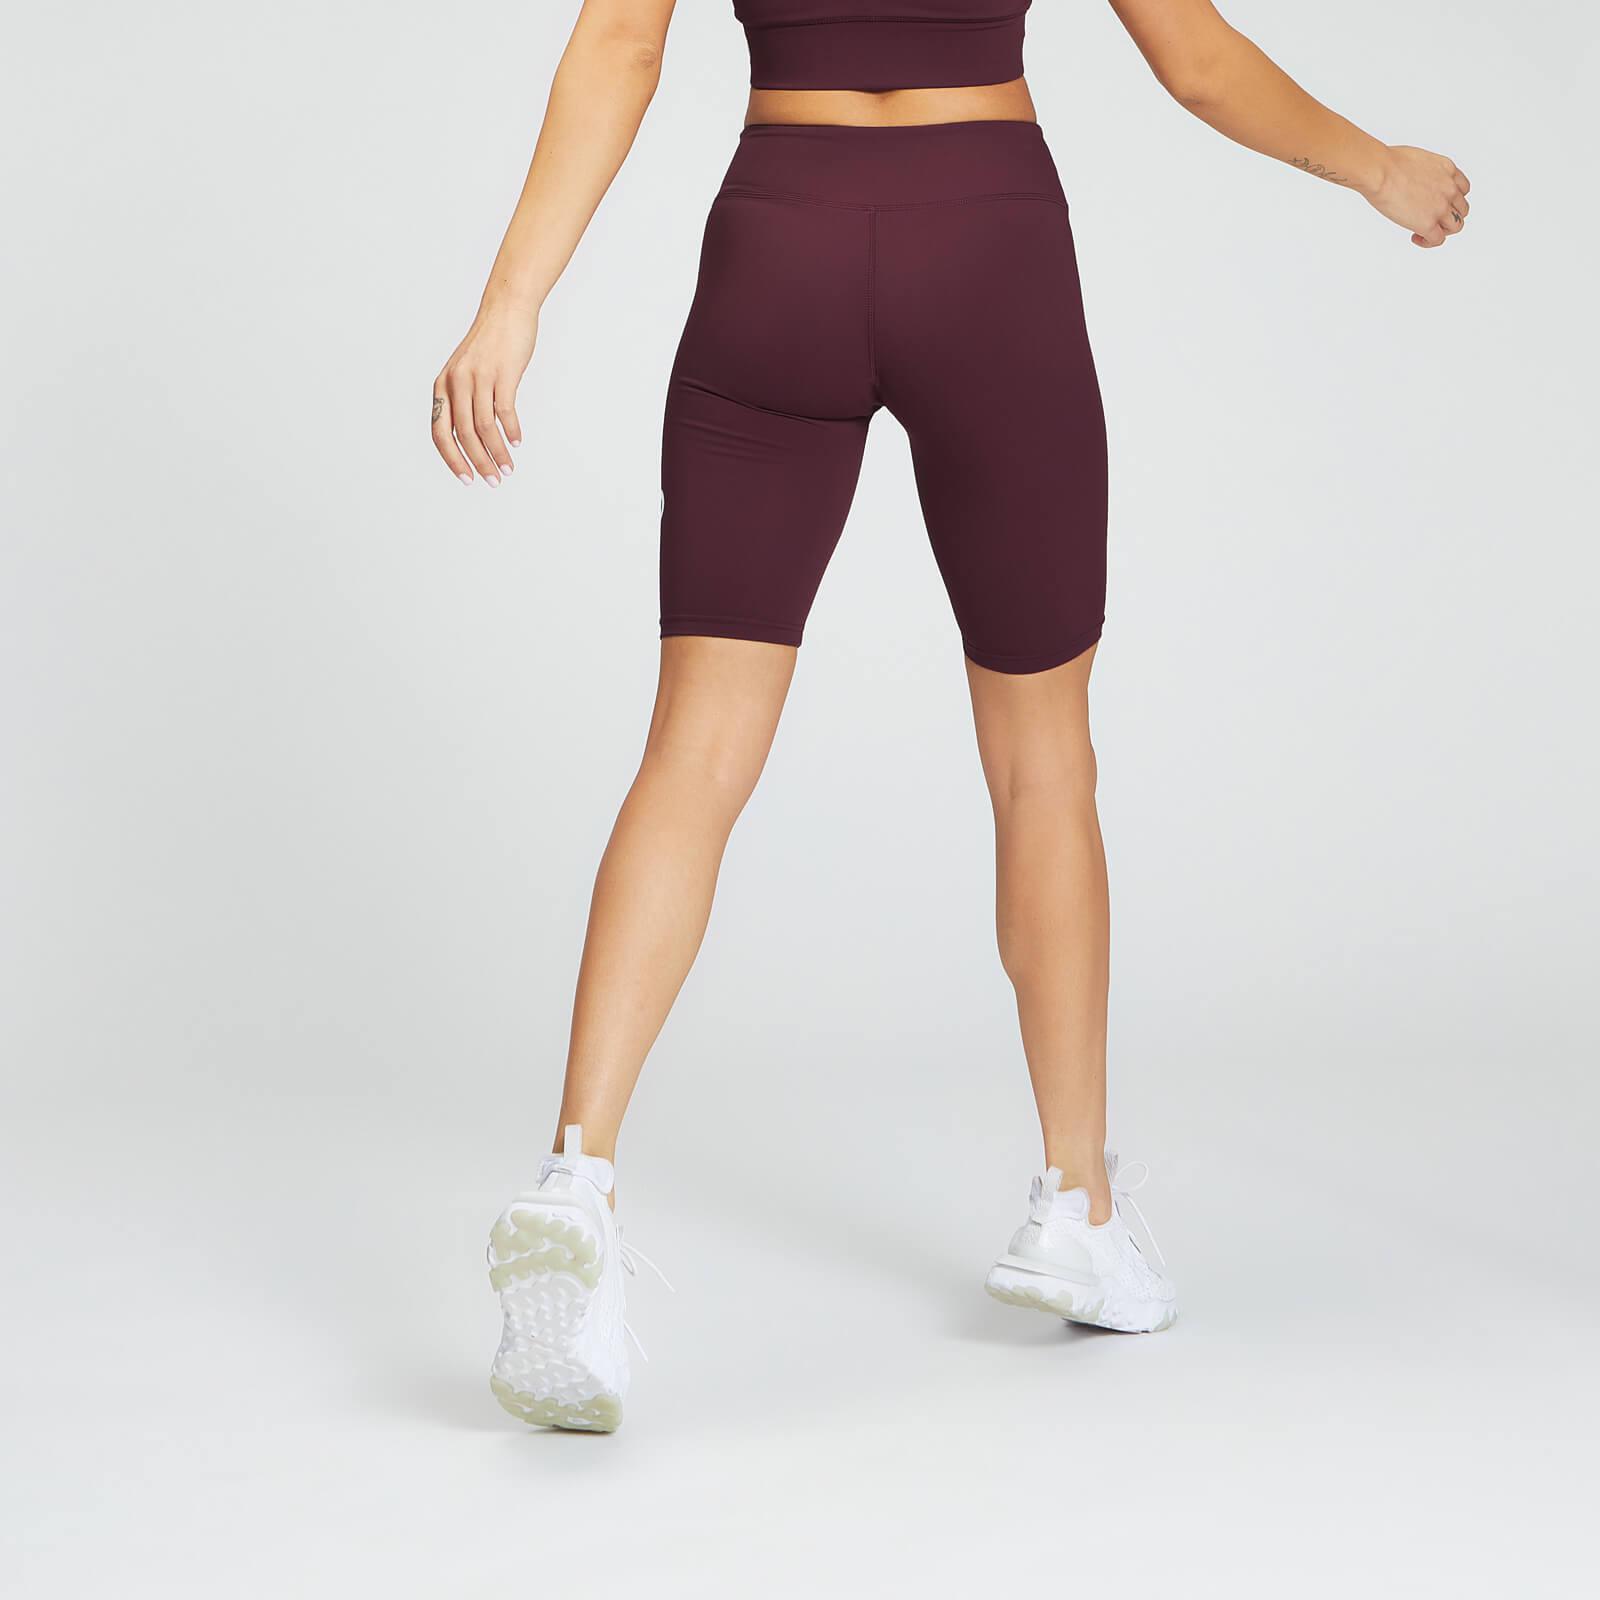 mp essentials training women's full length cycling short - port - xxs